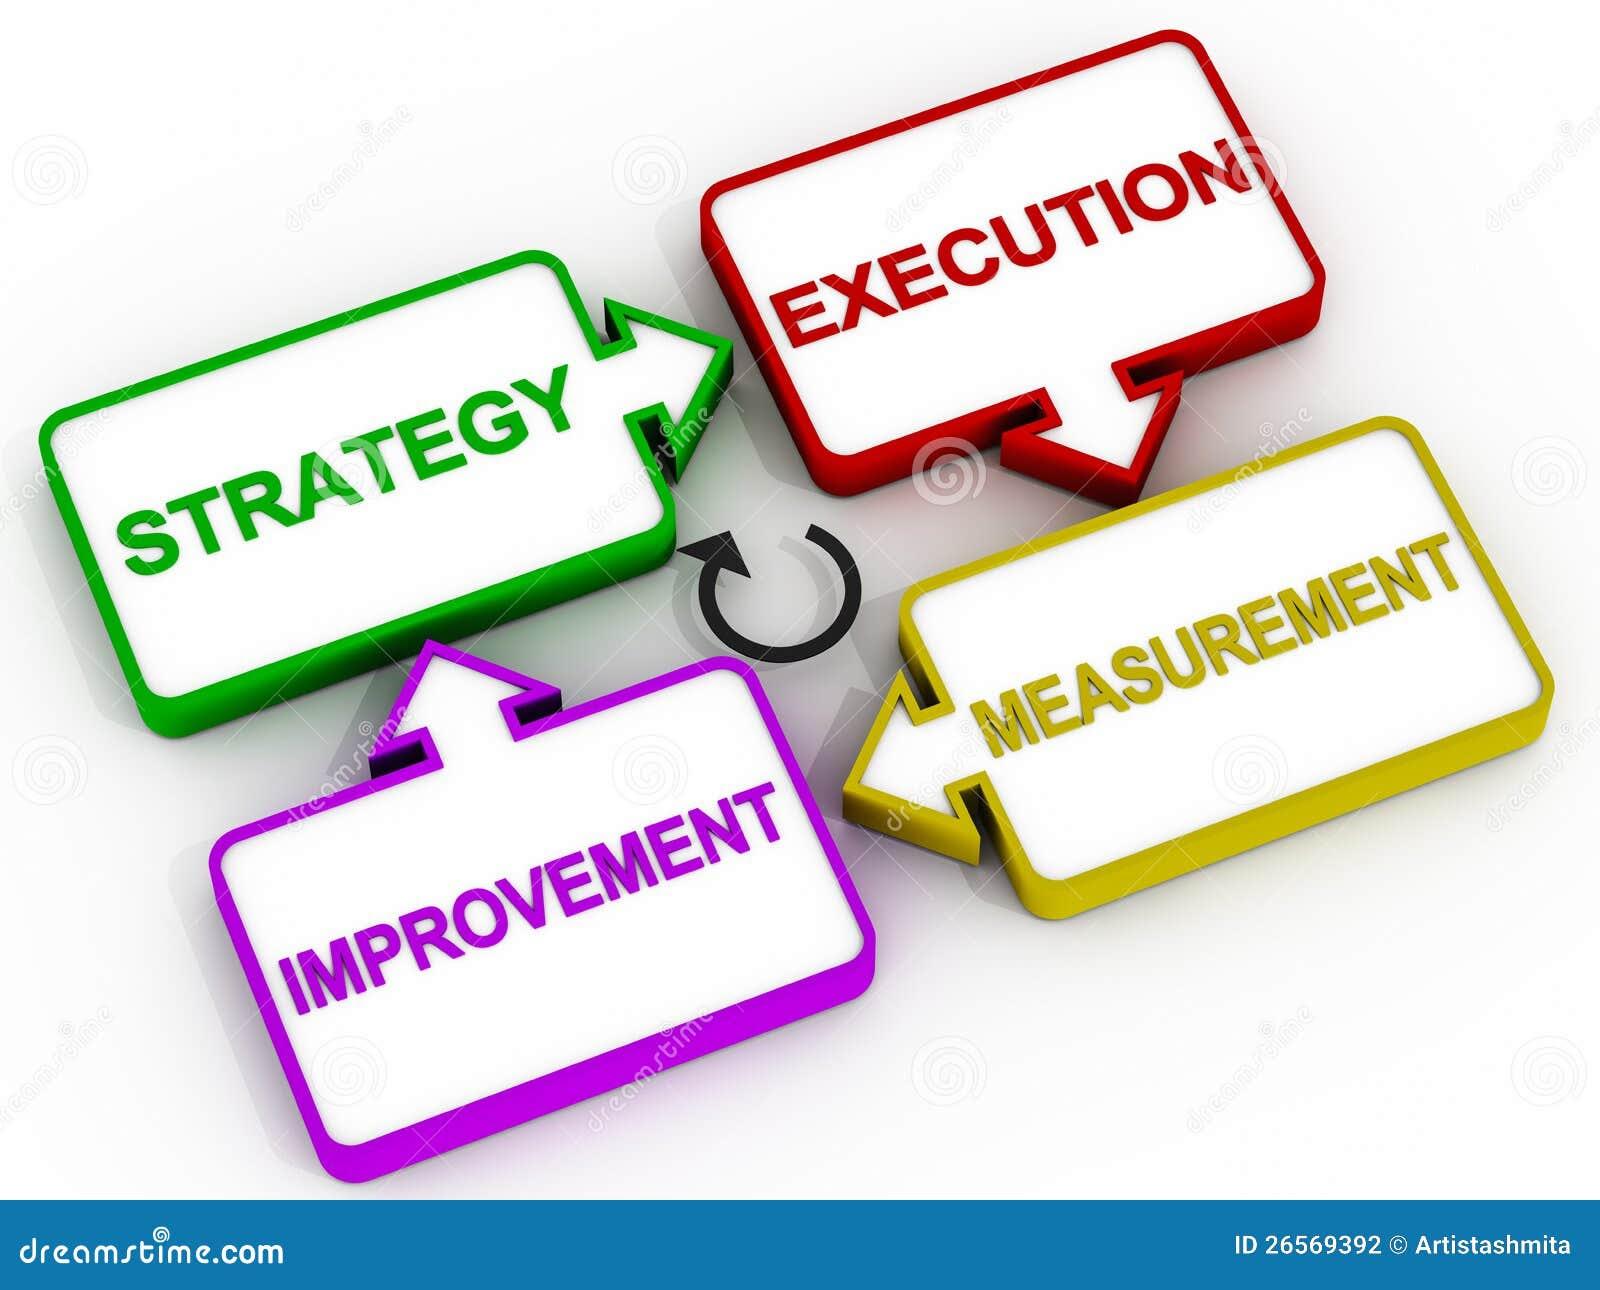 Magnificent Continuous Improvement Strategy 1300 x 1065 · 138 kB · jpeg